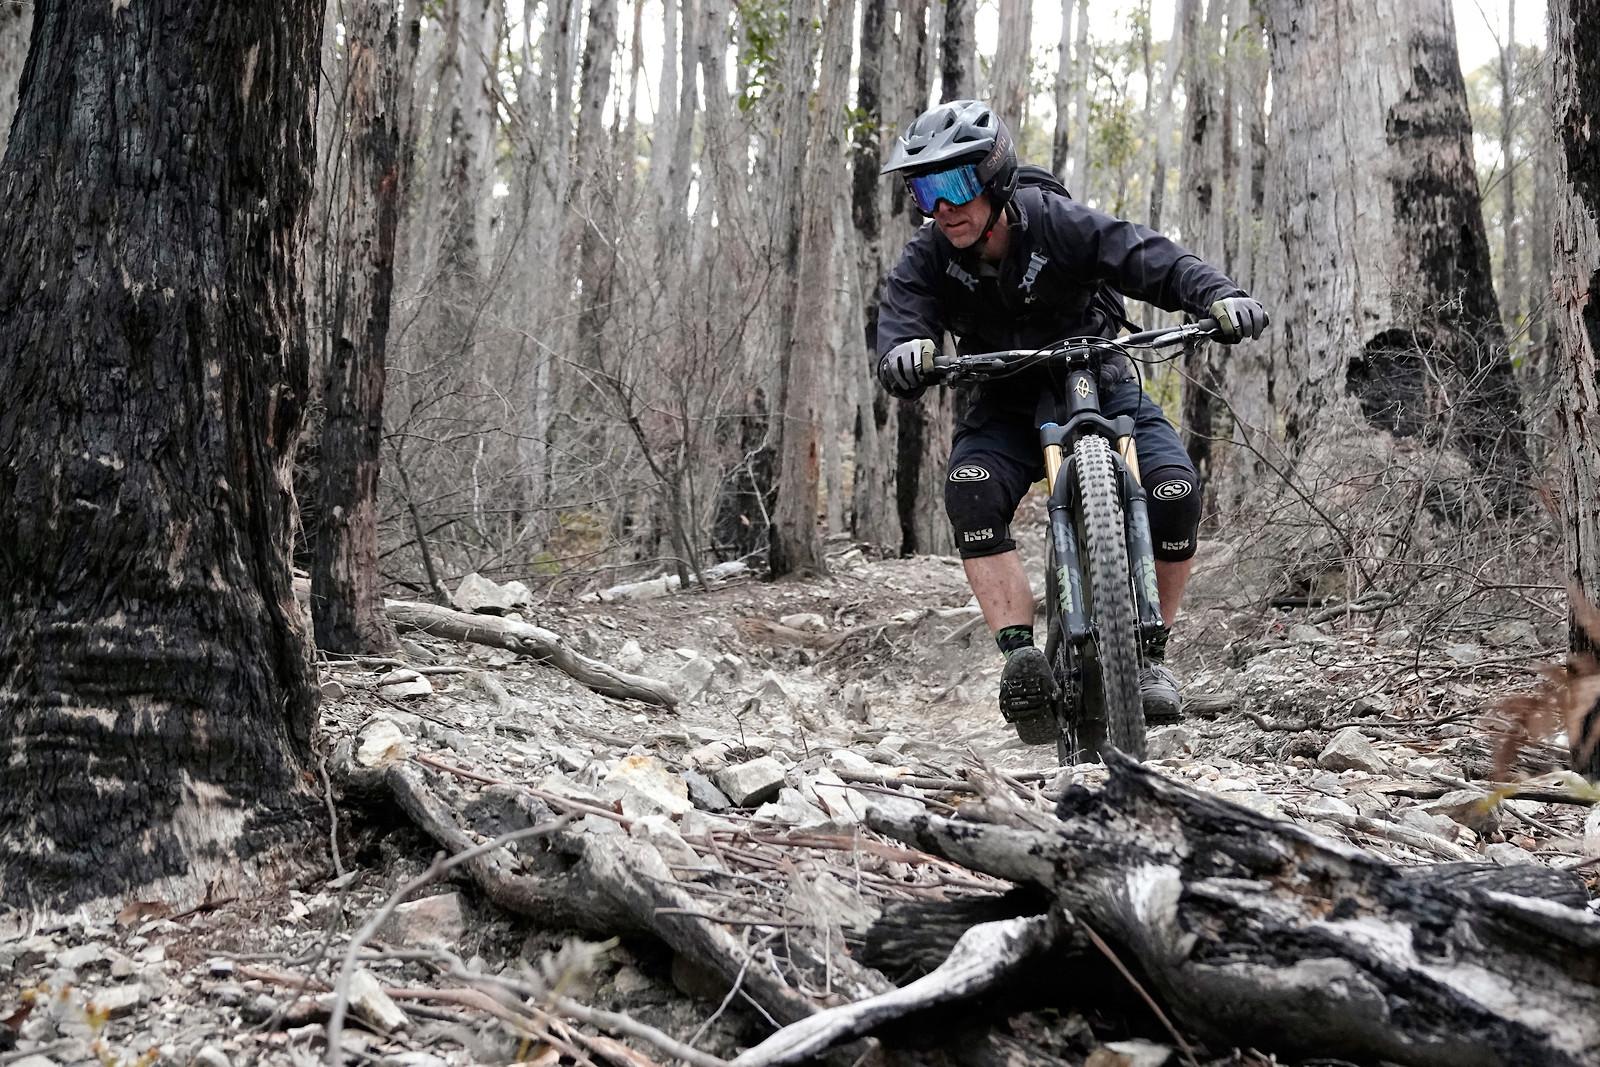 Dropz. South Hobart - digitalhippie - Mountain Biking Pictures - Vital MTB